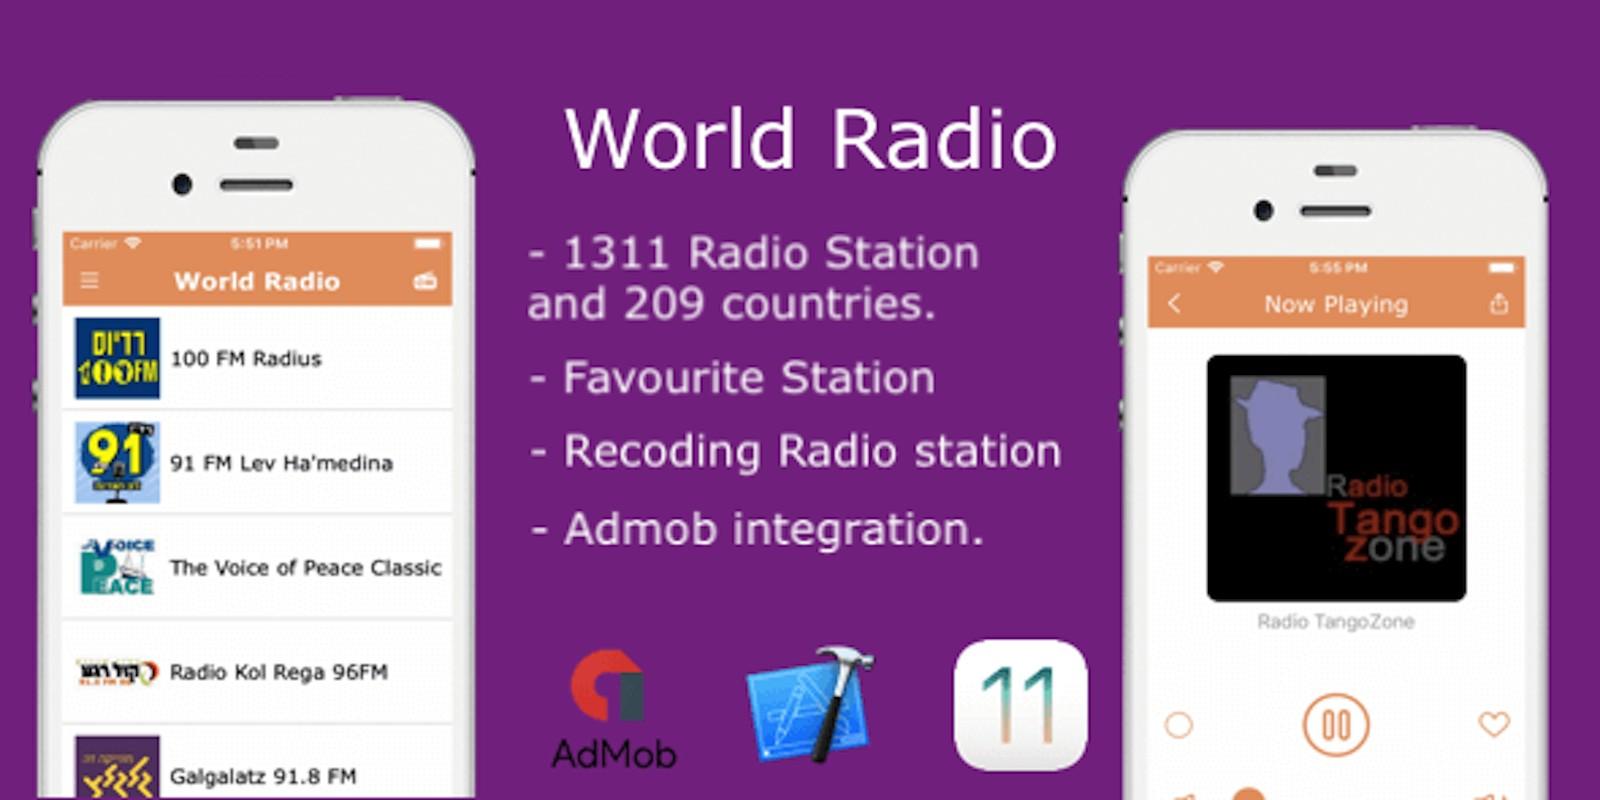 World Radio - iOS Source Code